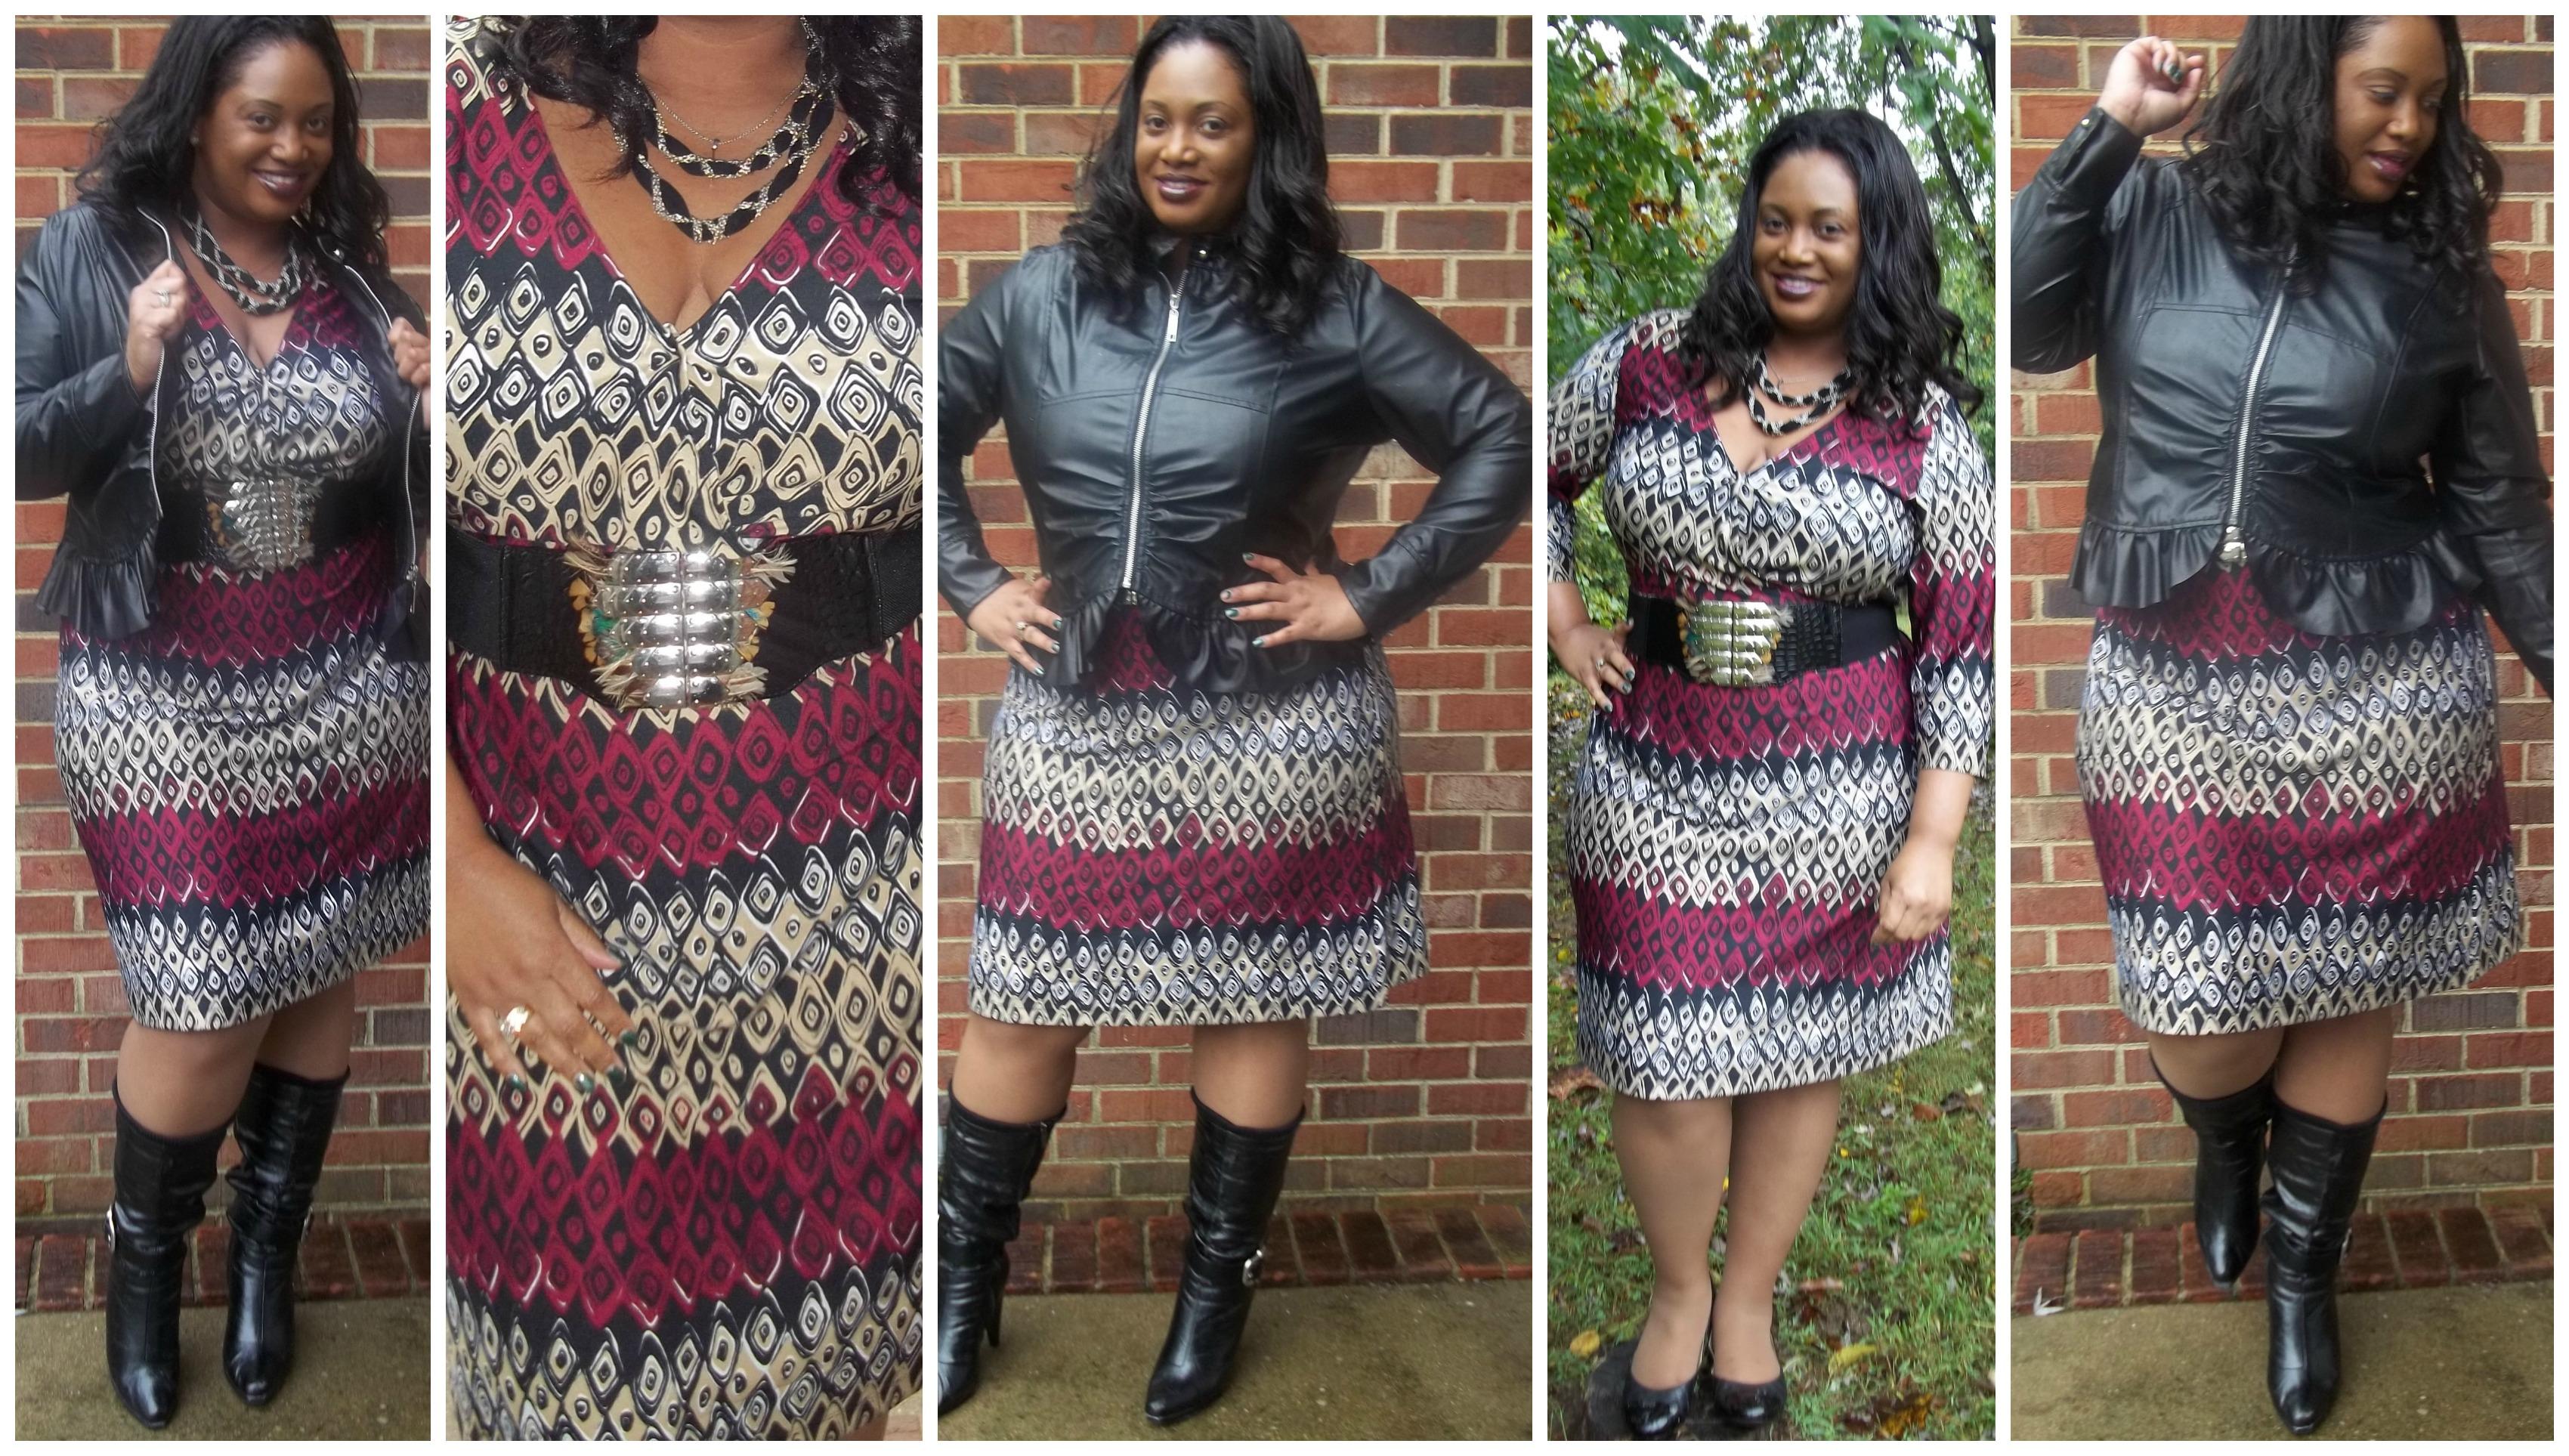 92733d833f8 JMS Print Dress  2 Collage.  Web2Shot http www justmysize com webapp wcs stores servlet  1386972505  bf09533f0e114f2ea730eb392853178683900093 600